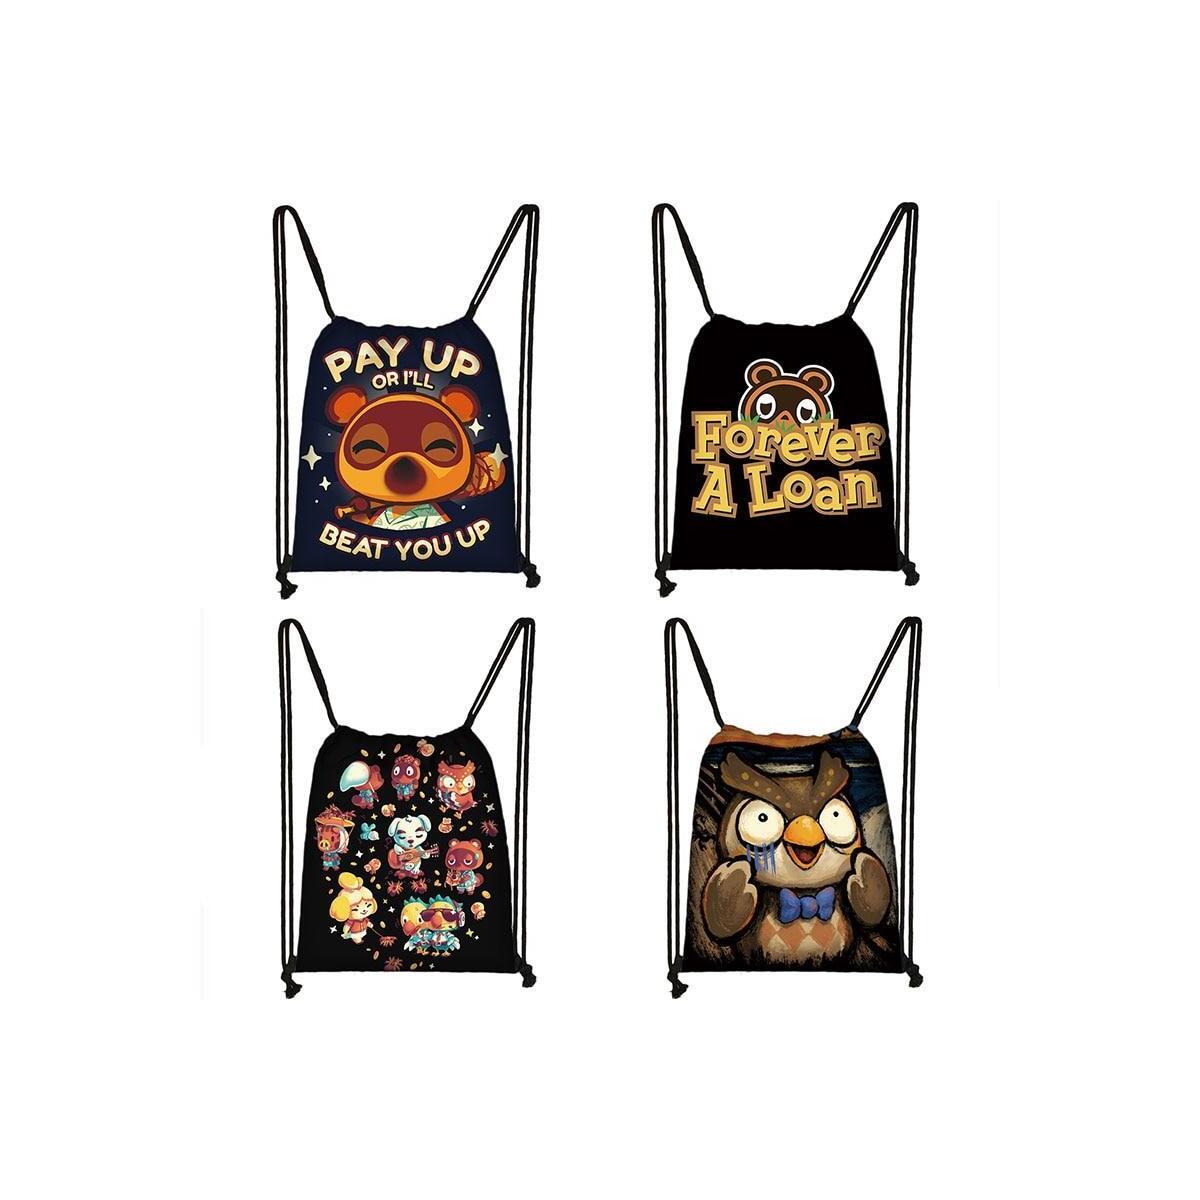 Animal Crossing Drawstring Backpack, skdanimalcr19